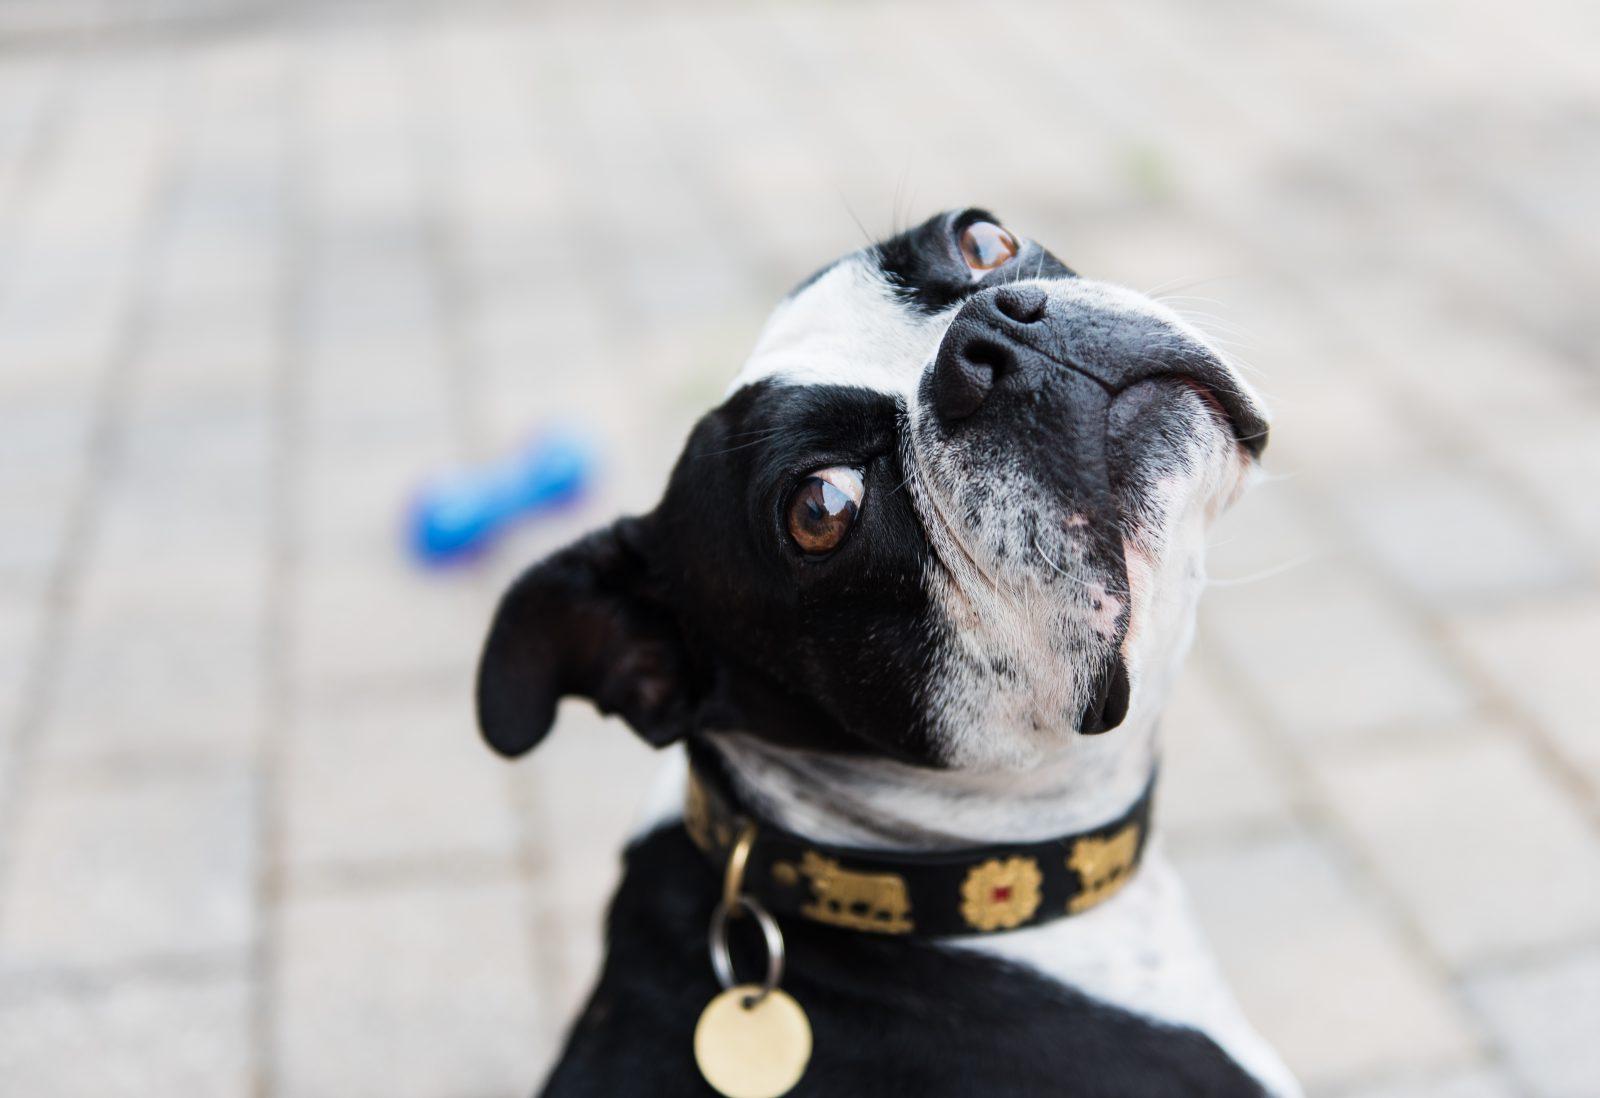 fatos-curiosos-cachorros-placas-identificacao-boston-terrier